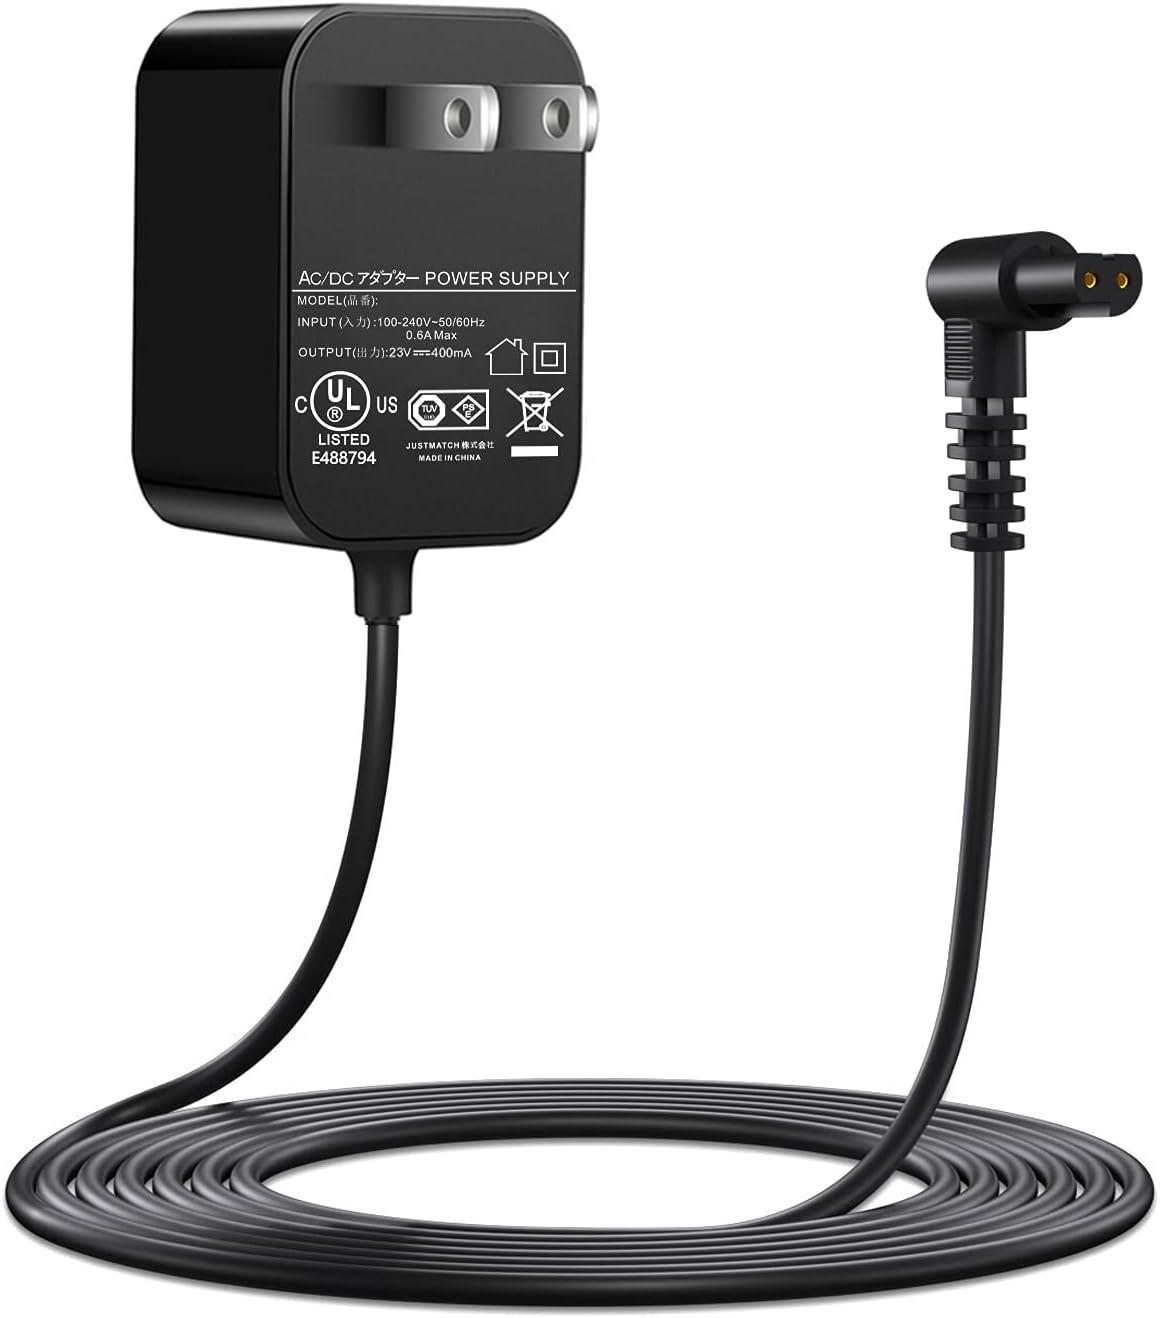 23V Charger for Black + Stick Decker Handhe 90602523-04 Recommended Cordless Charlotte Mall